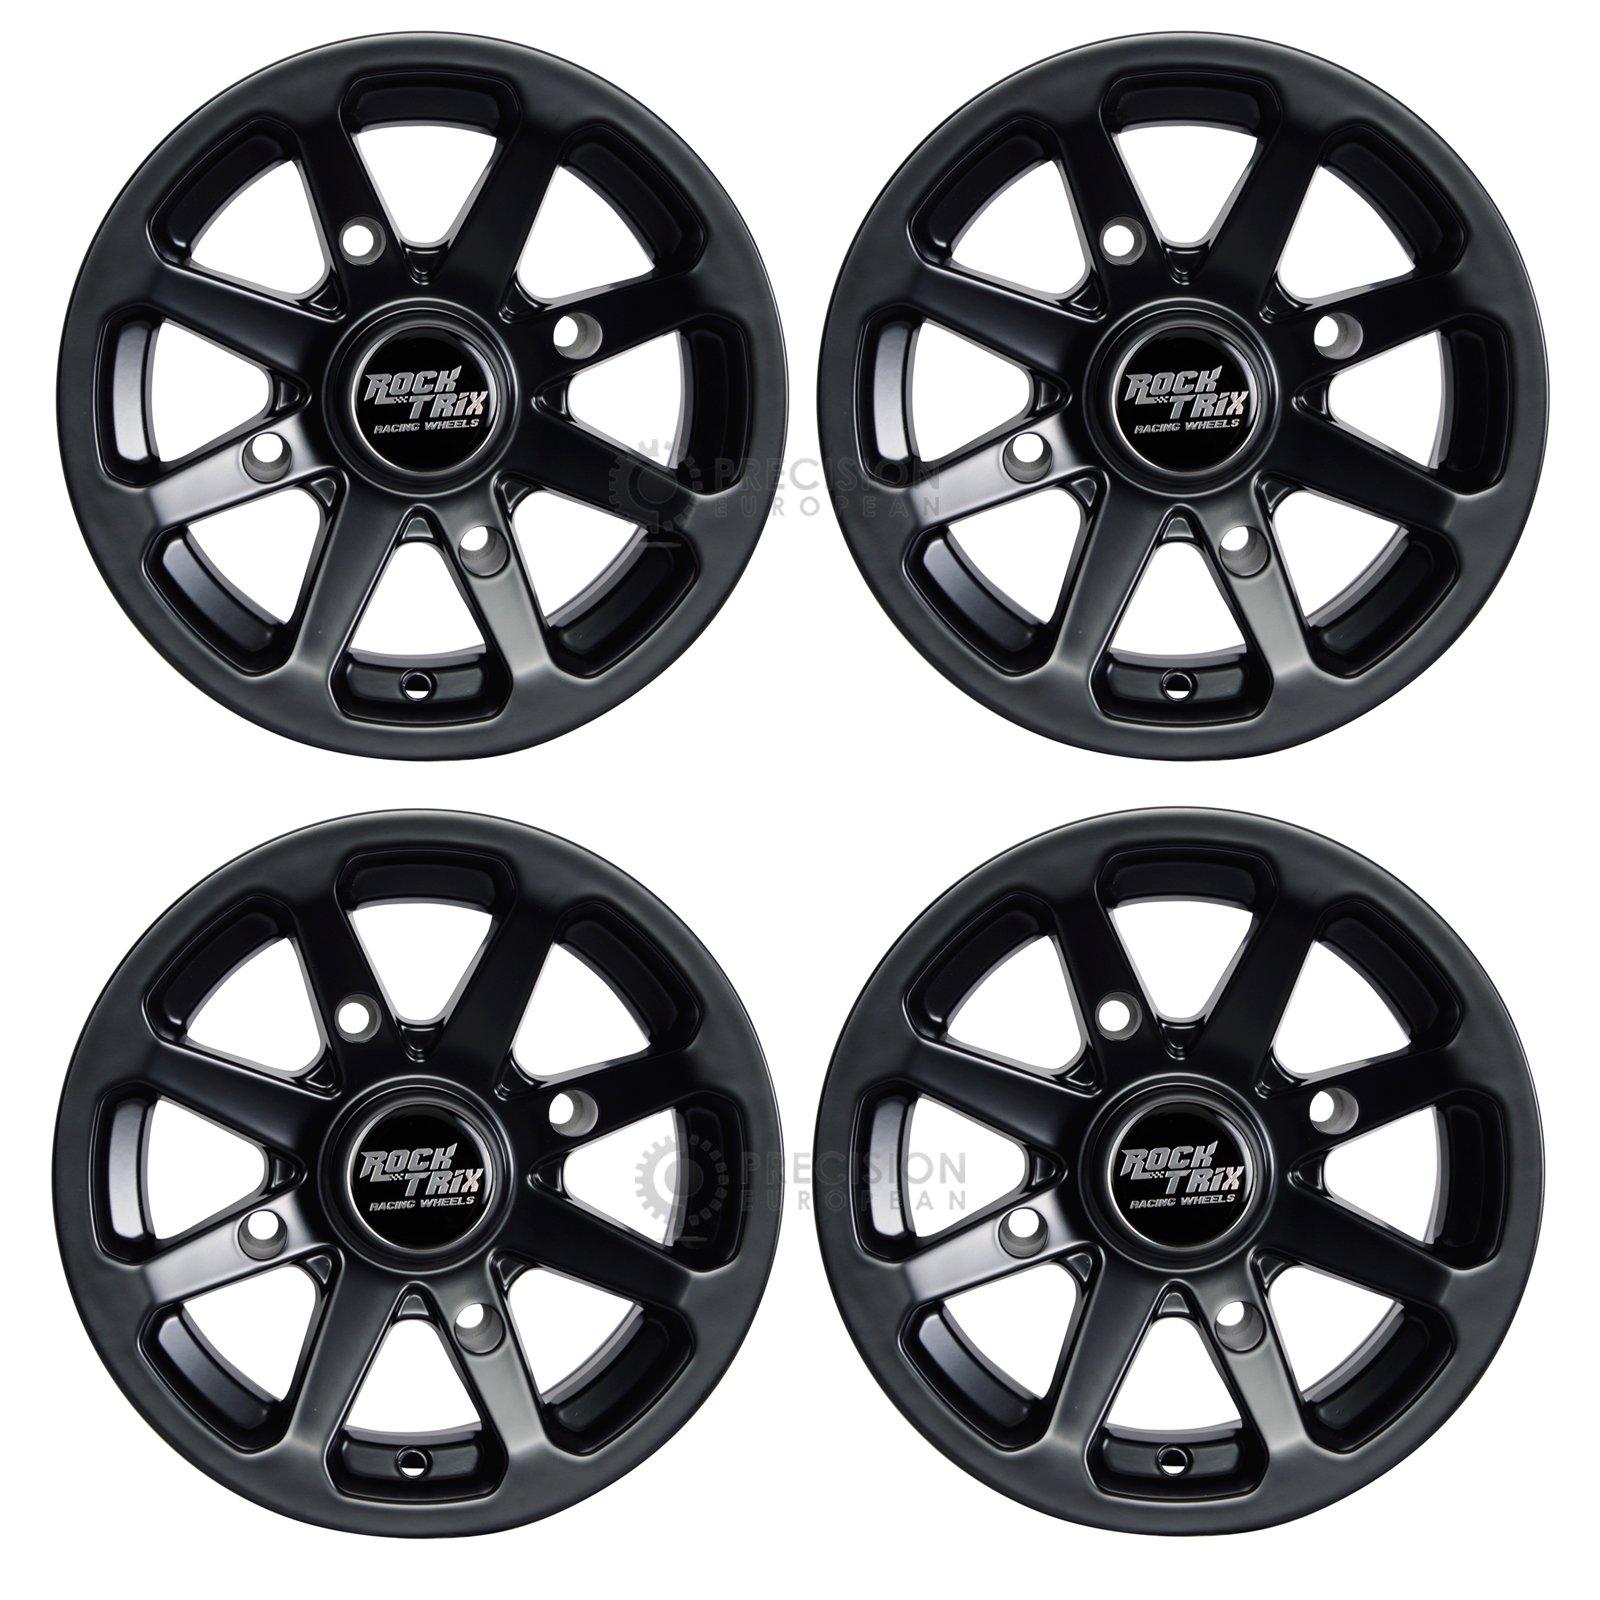 4pc 12'' RockTrix ATV Wheels 12x7 Rims Matte Black | 4x156 Bolt Pattern | 4+3 offset | for many Polaris Sportsman RZR Ranger (4/156)